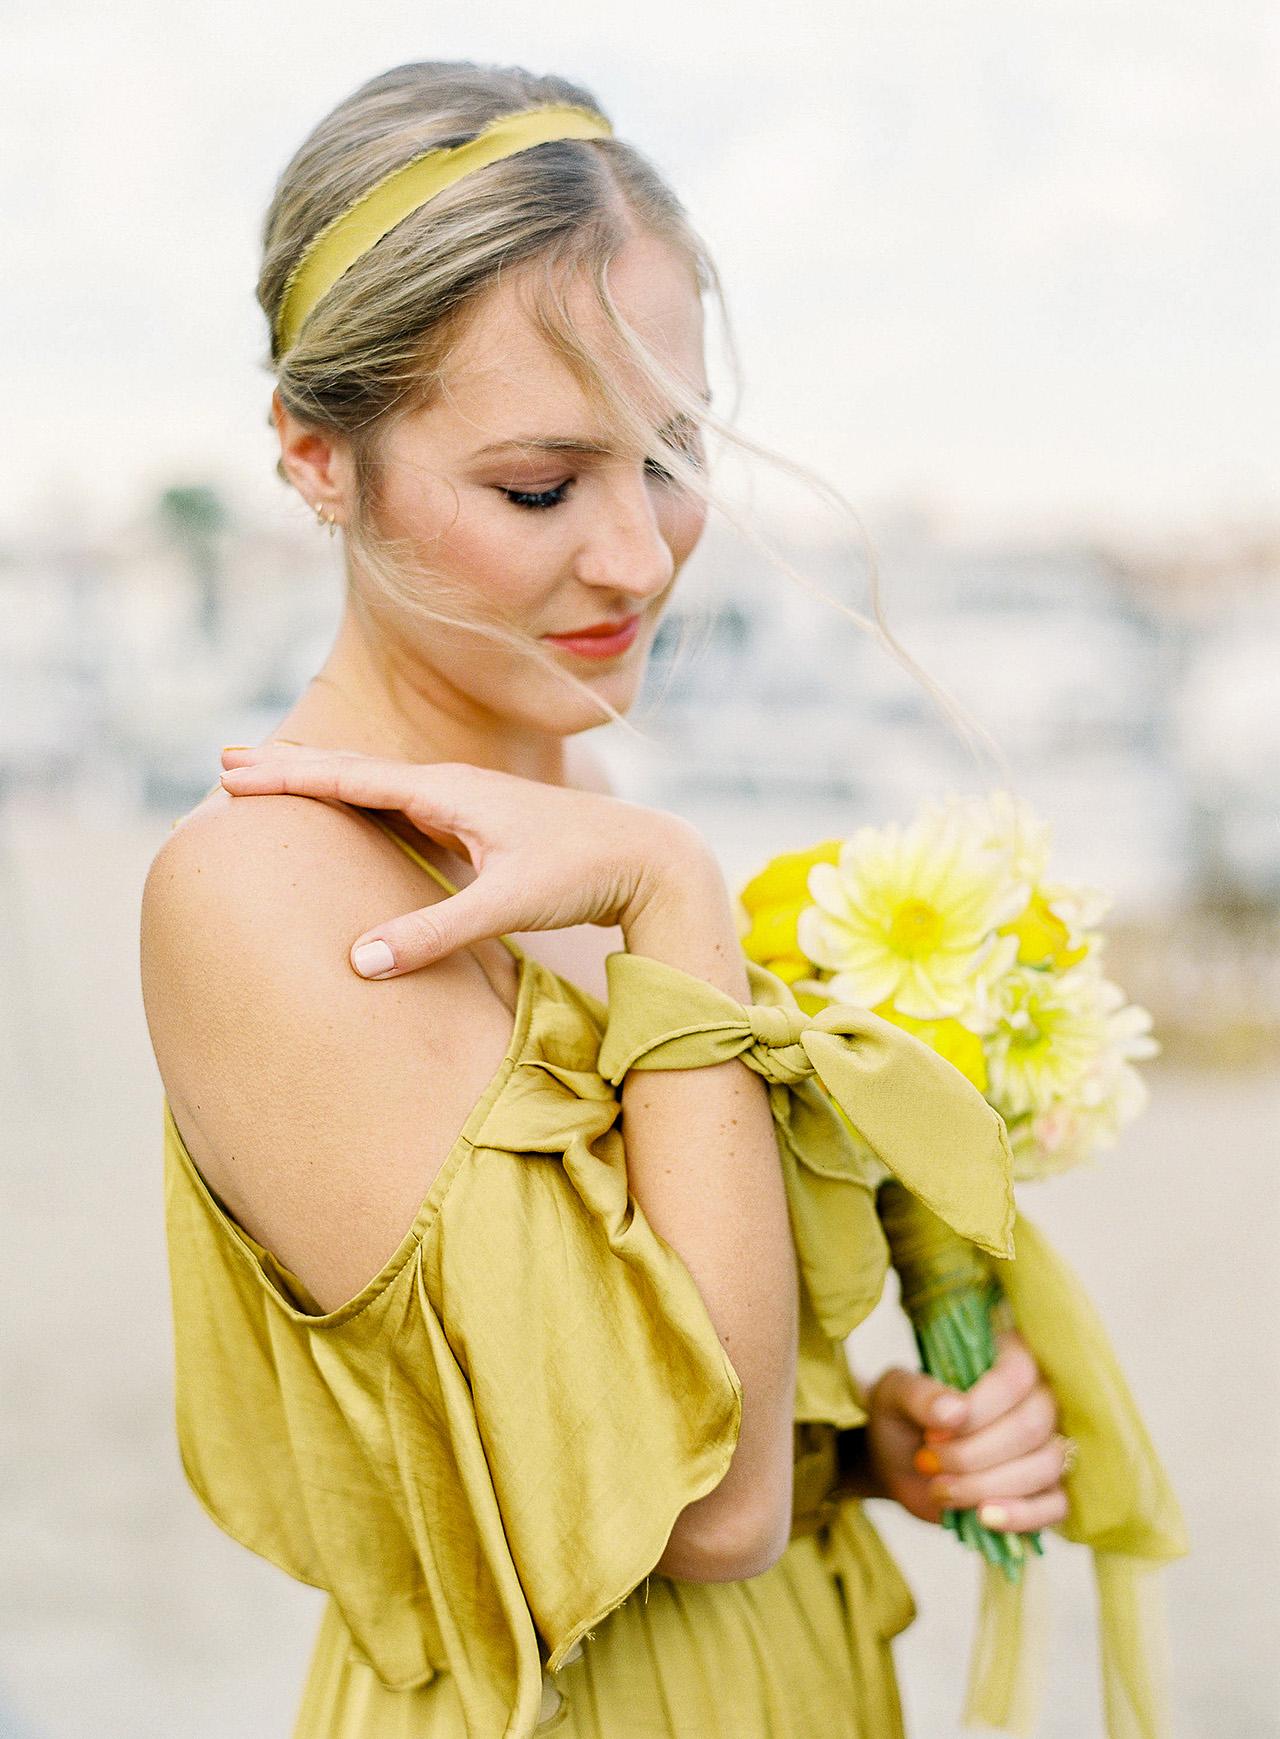 janelle stephen wedding bridesmaid yellow